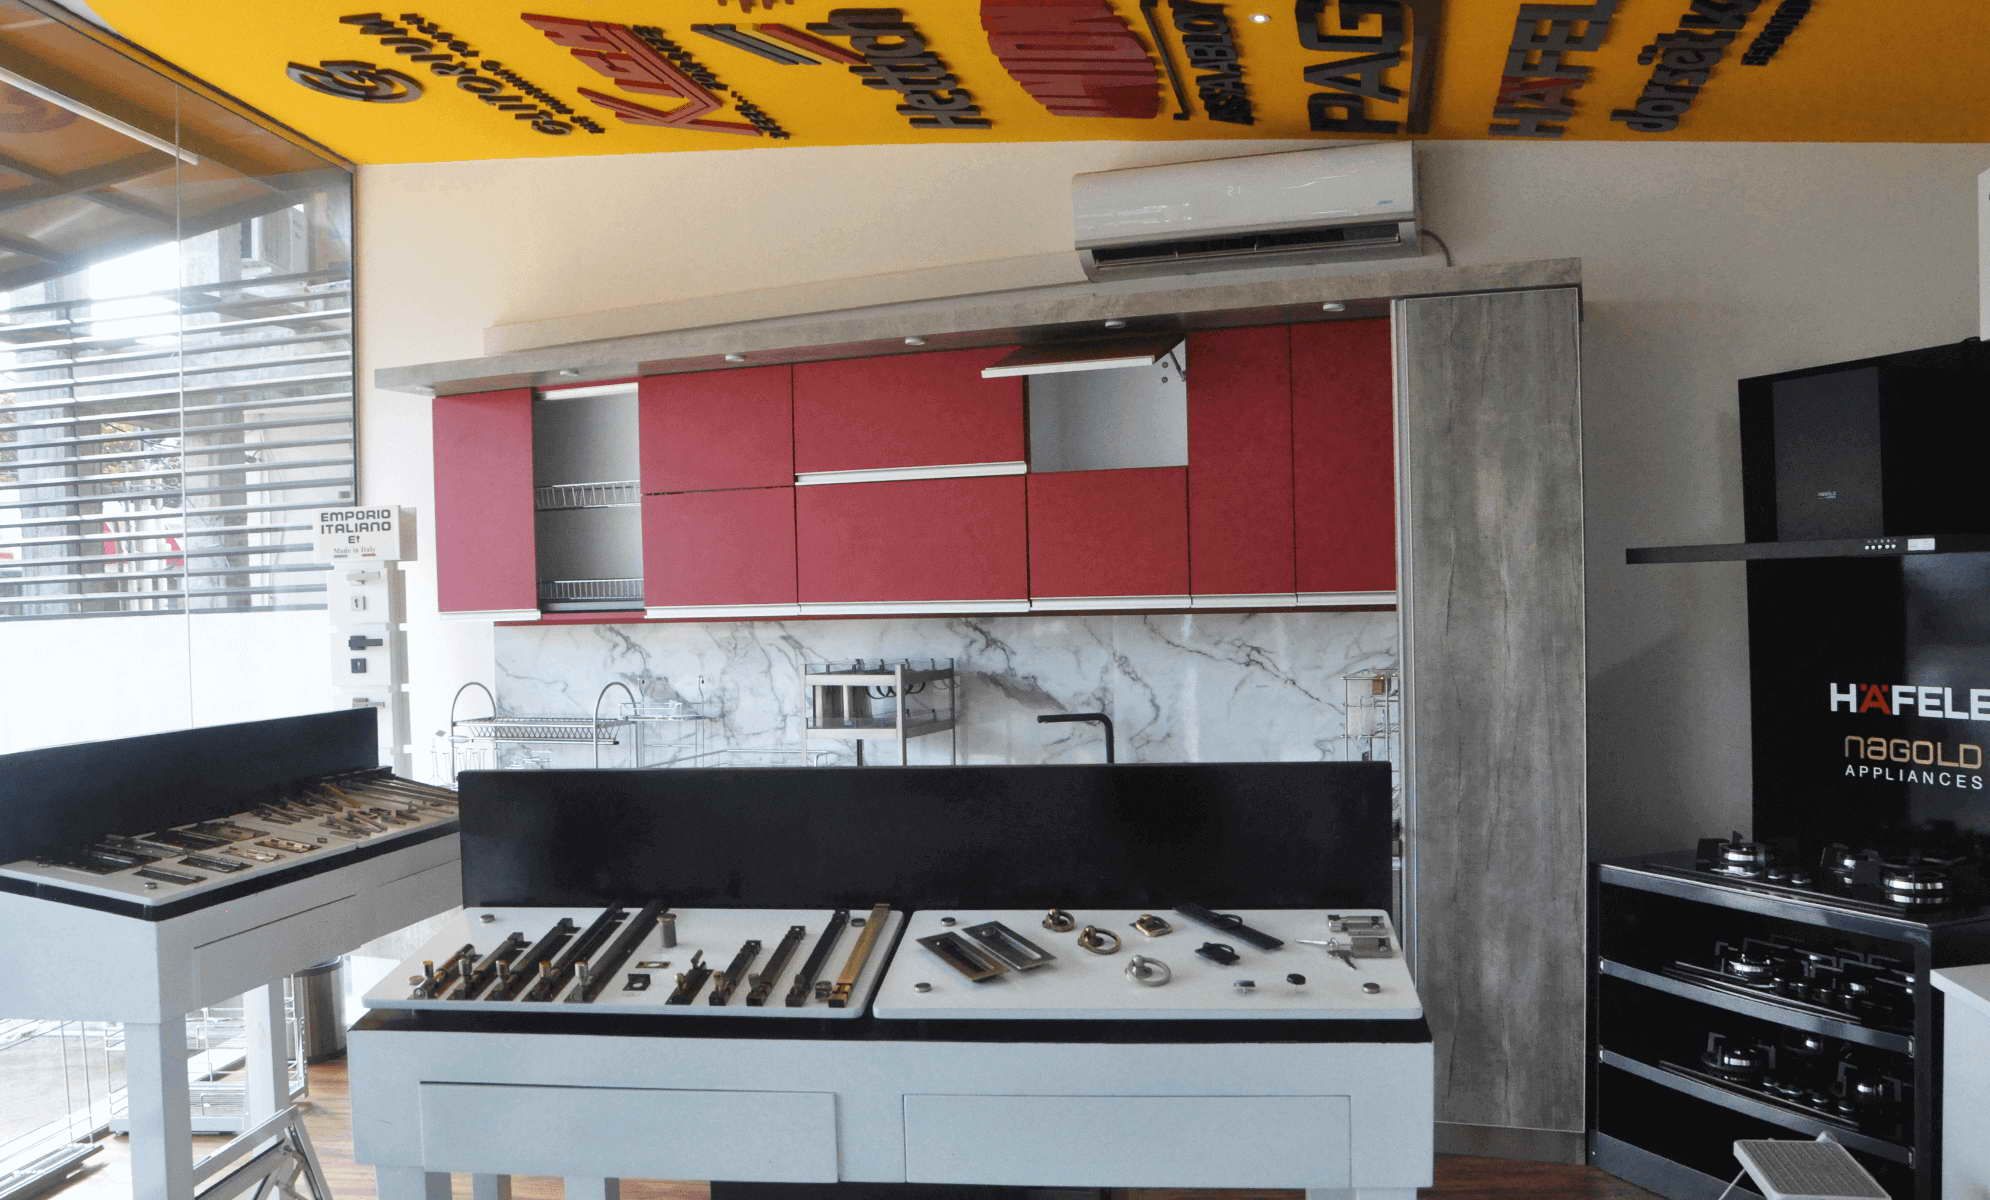 nawalanka-enterprises-architectural-and-furniture-hardware